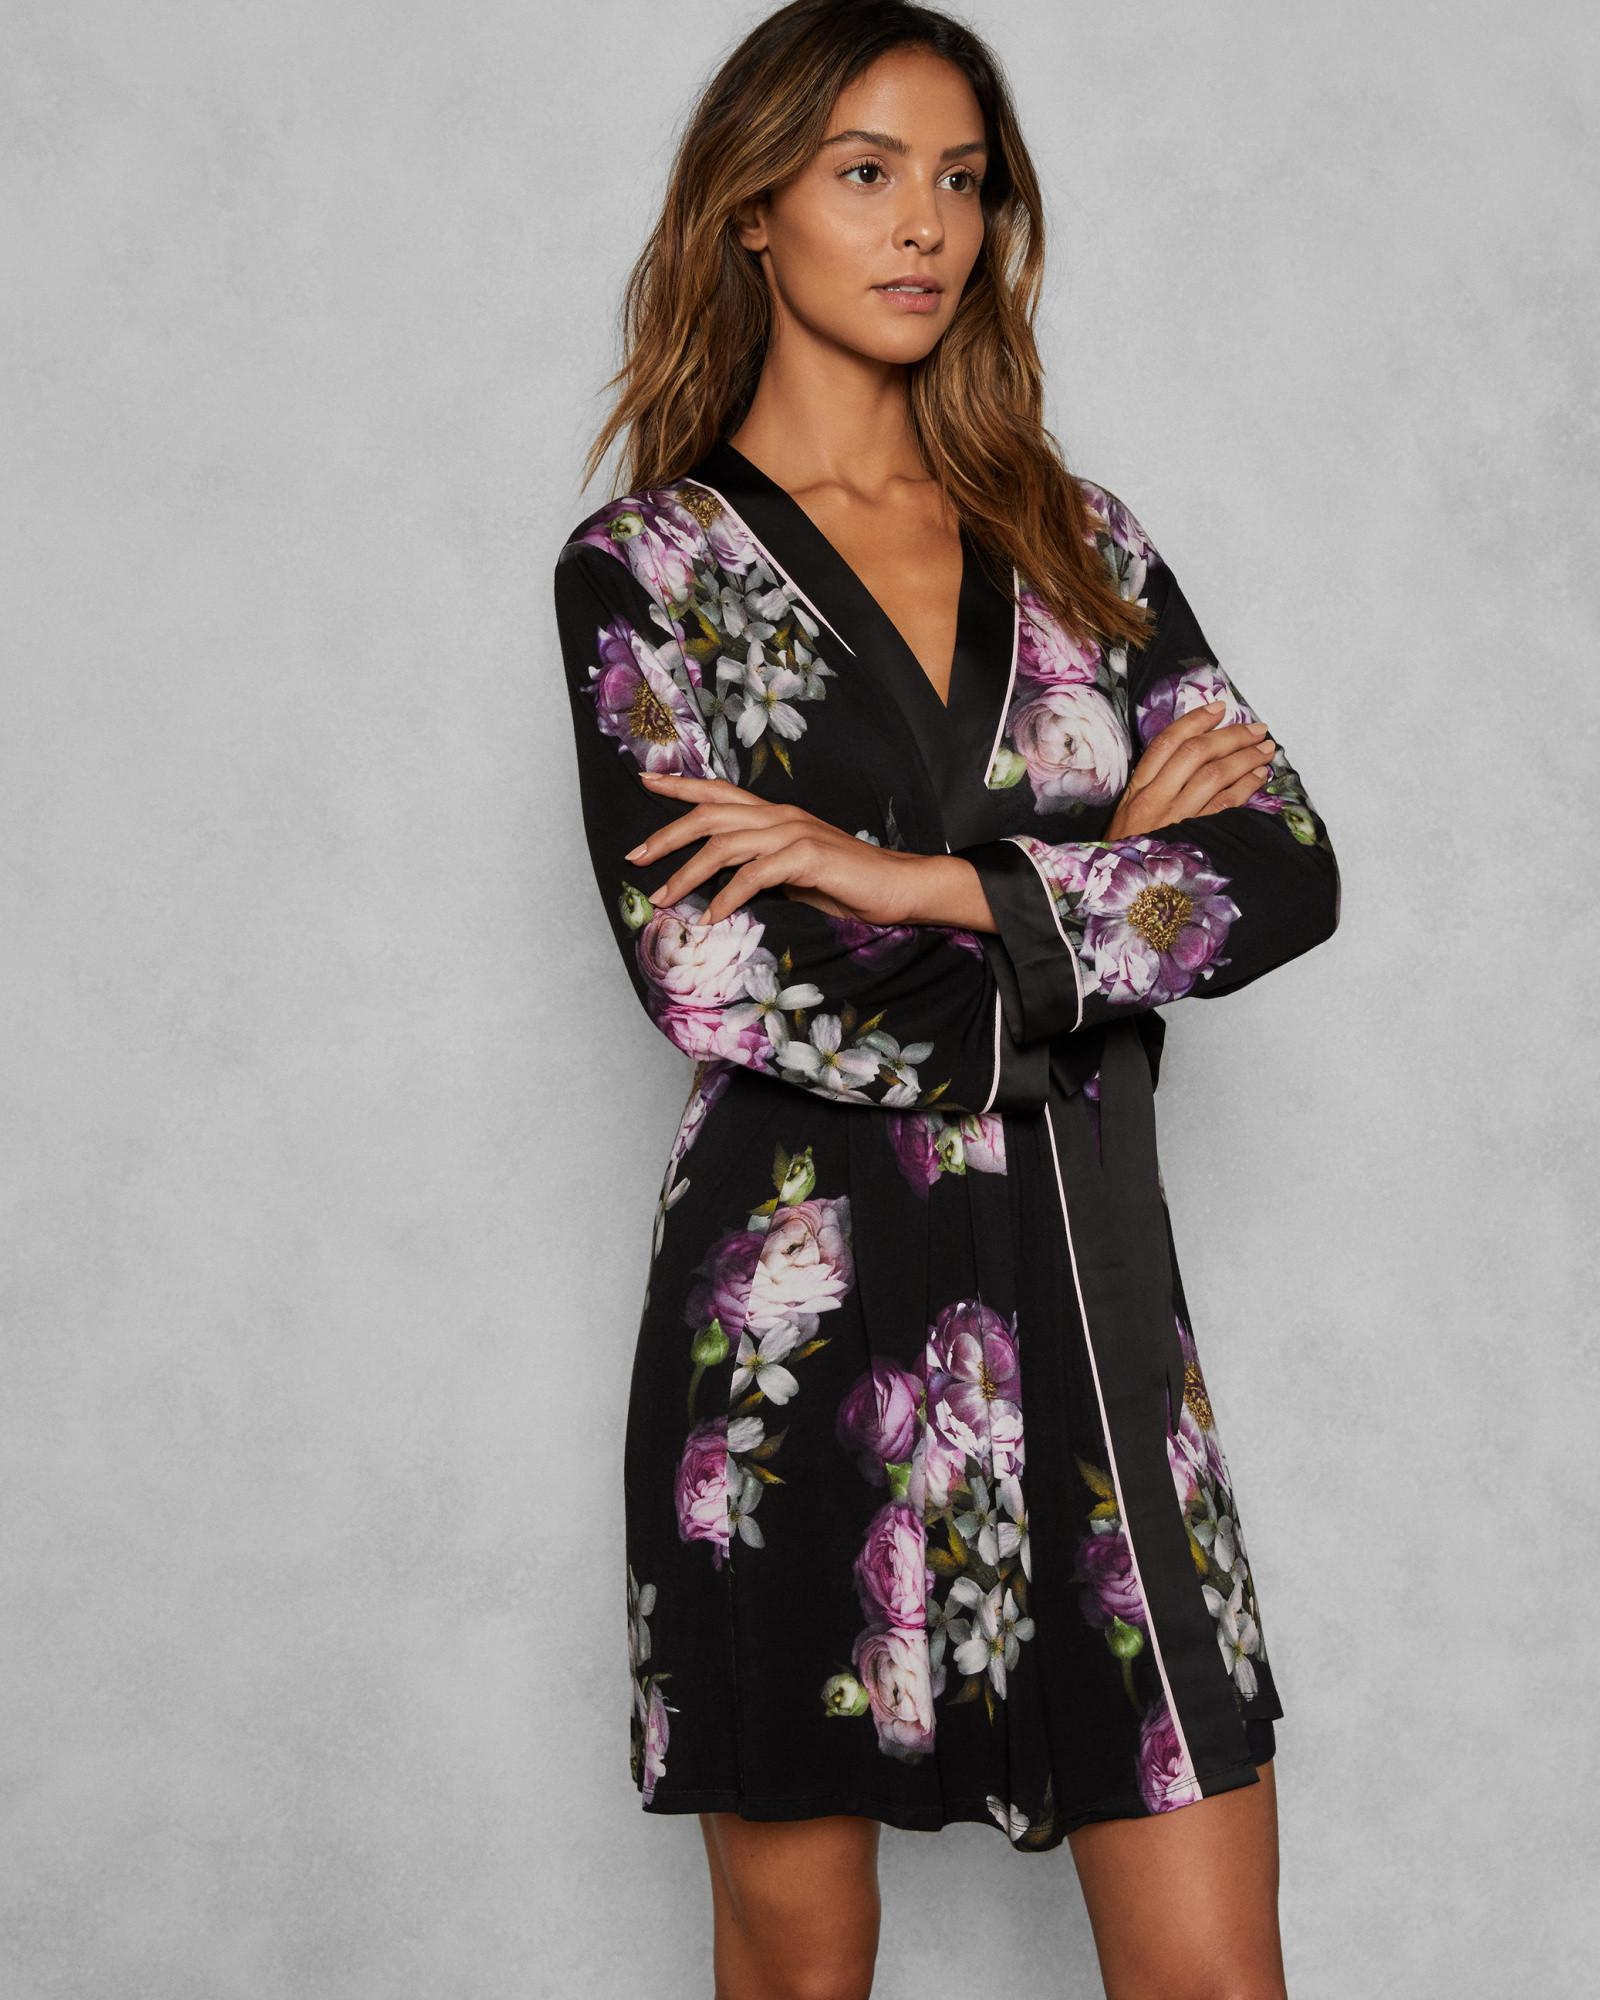 0269bf33ff349 Ted Baker Sunlit Floral Kimono Robe in Black - Lyst